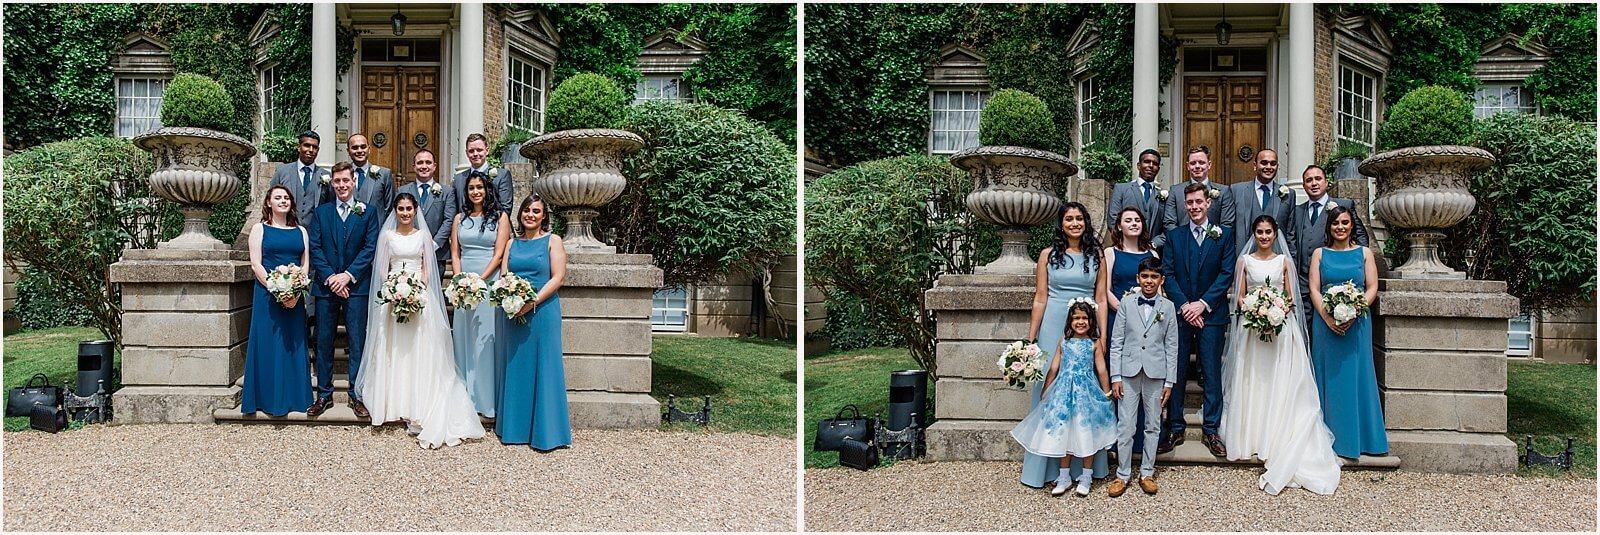 Hampton Court House Wedding | Nerrisa & Jason 51